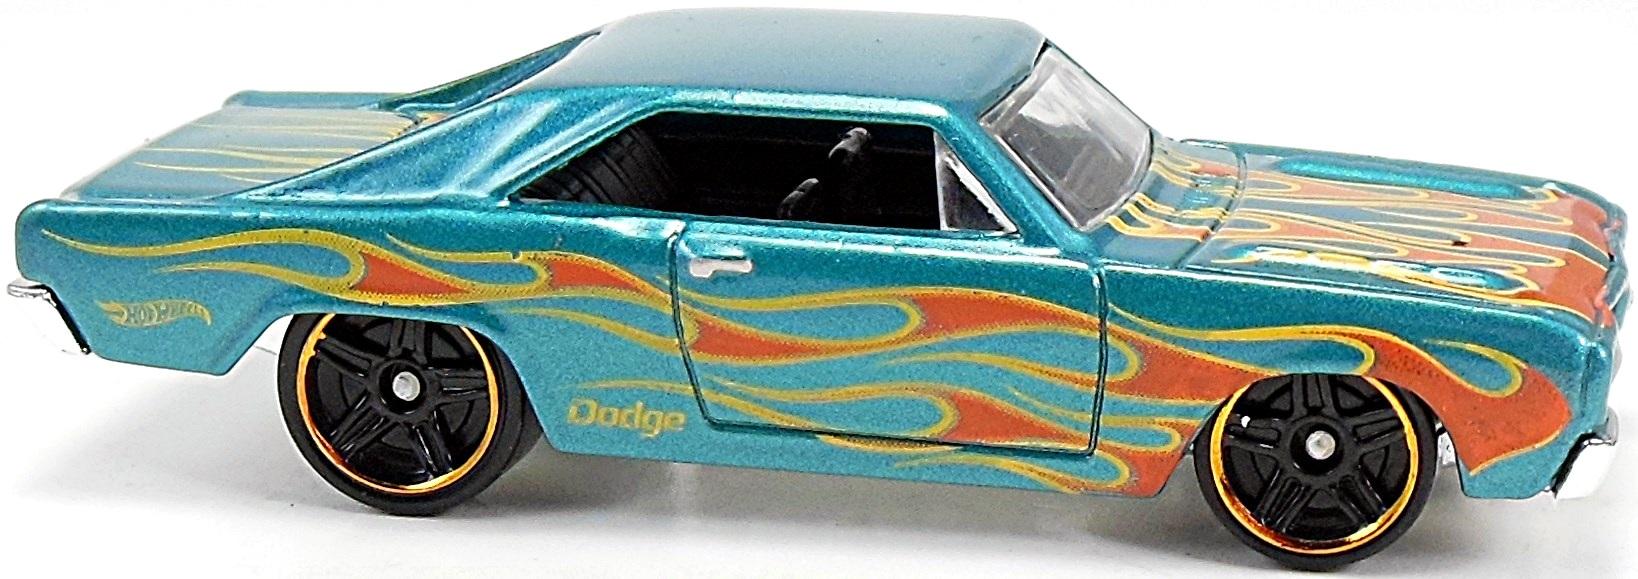 1974 Brazilian Dodge Charger 74mm 2014 Hot Wheels